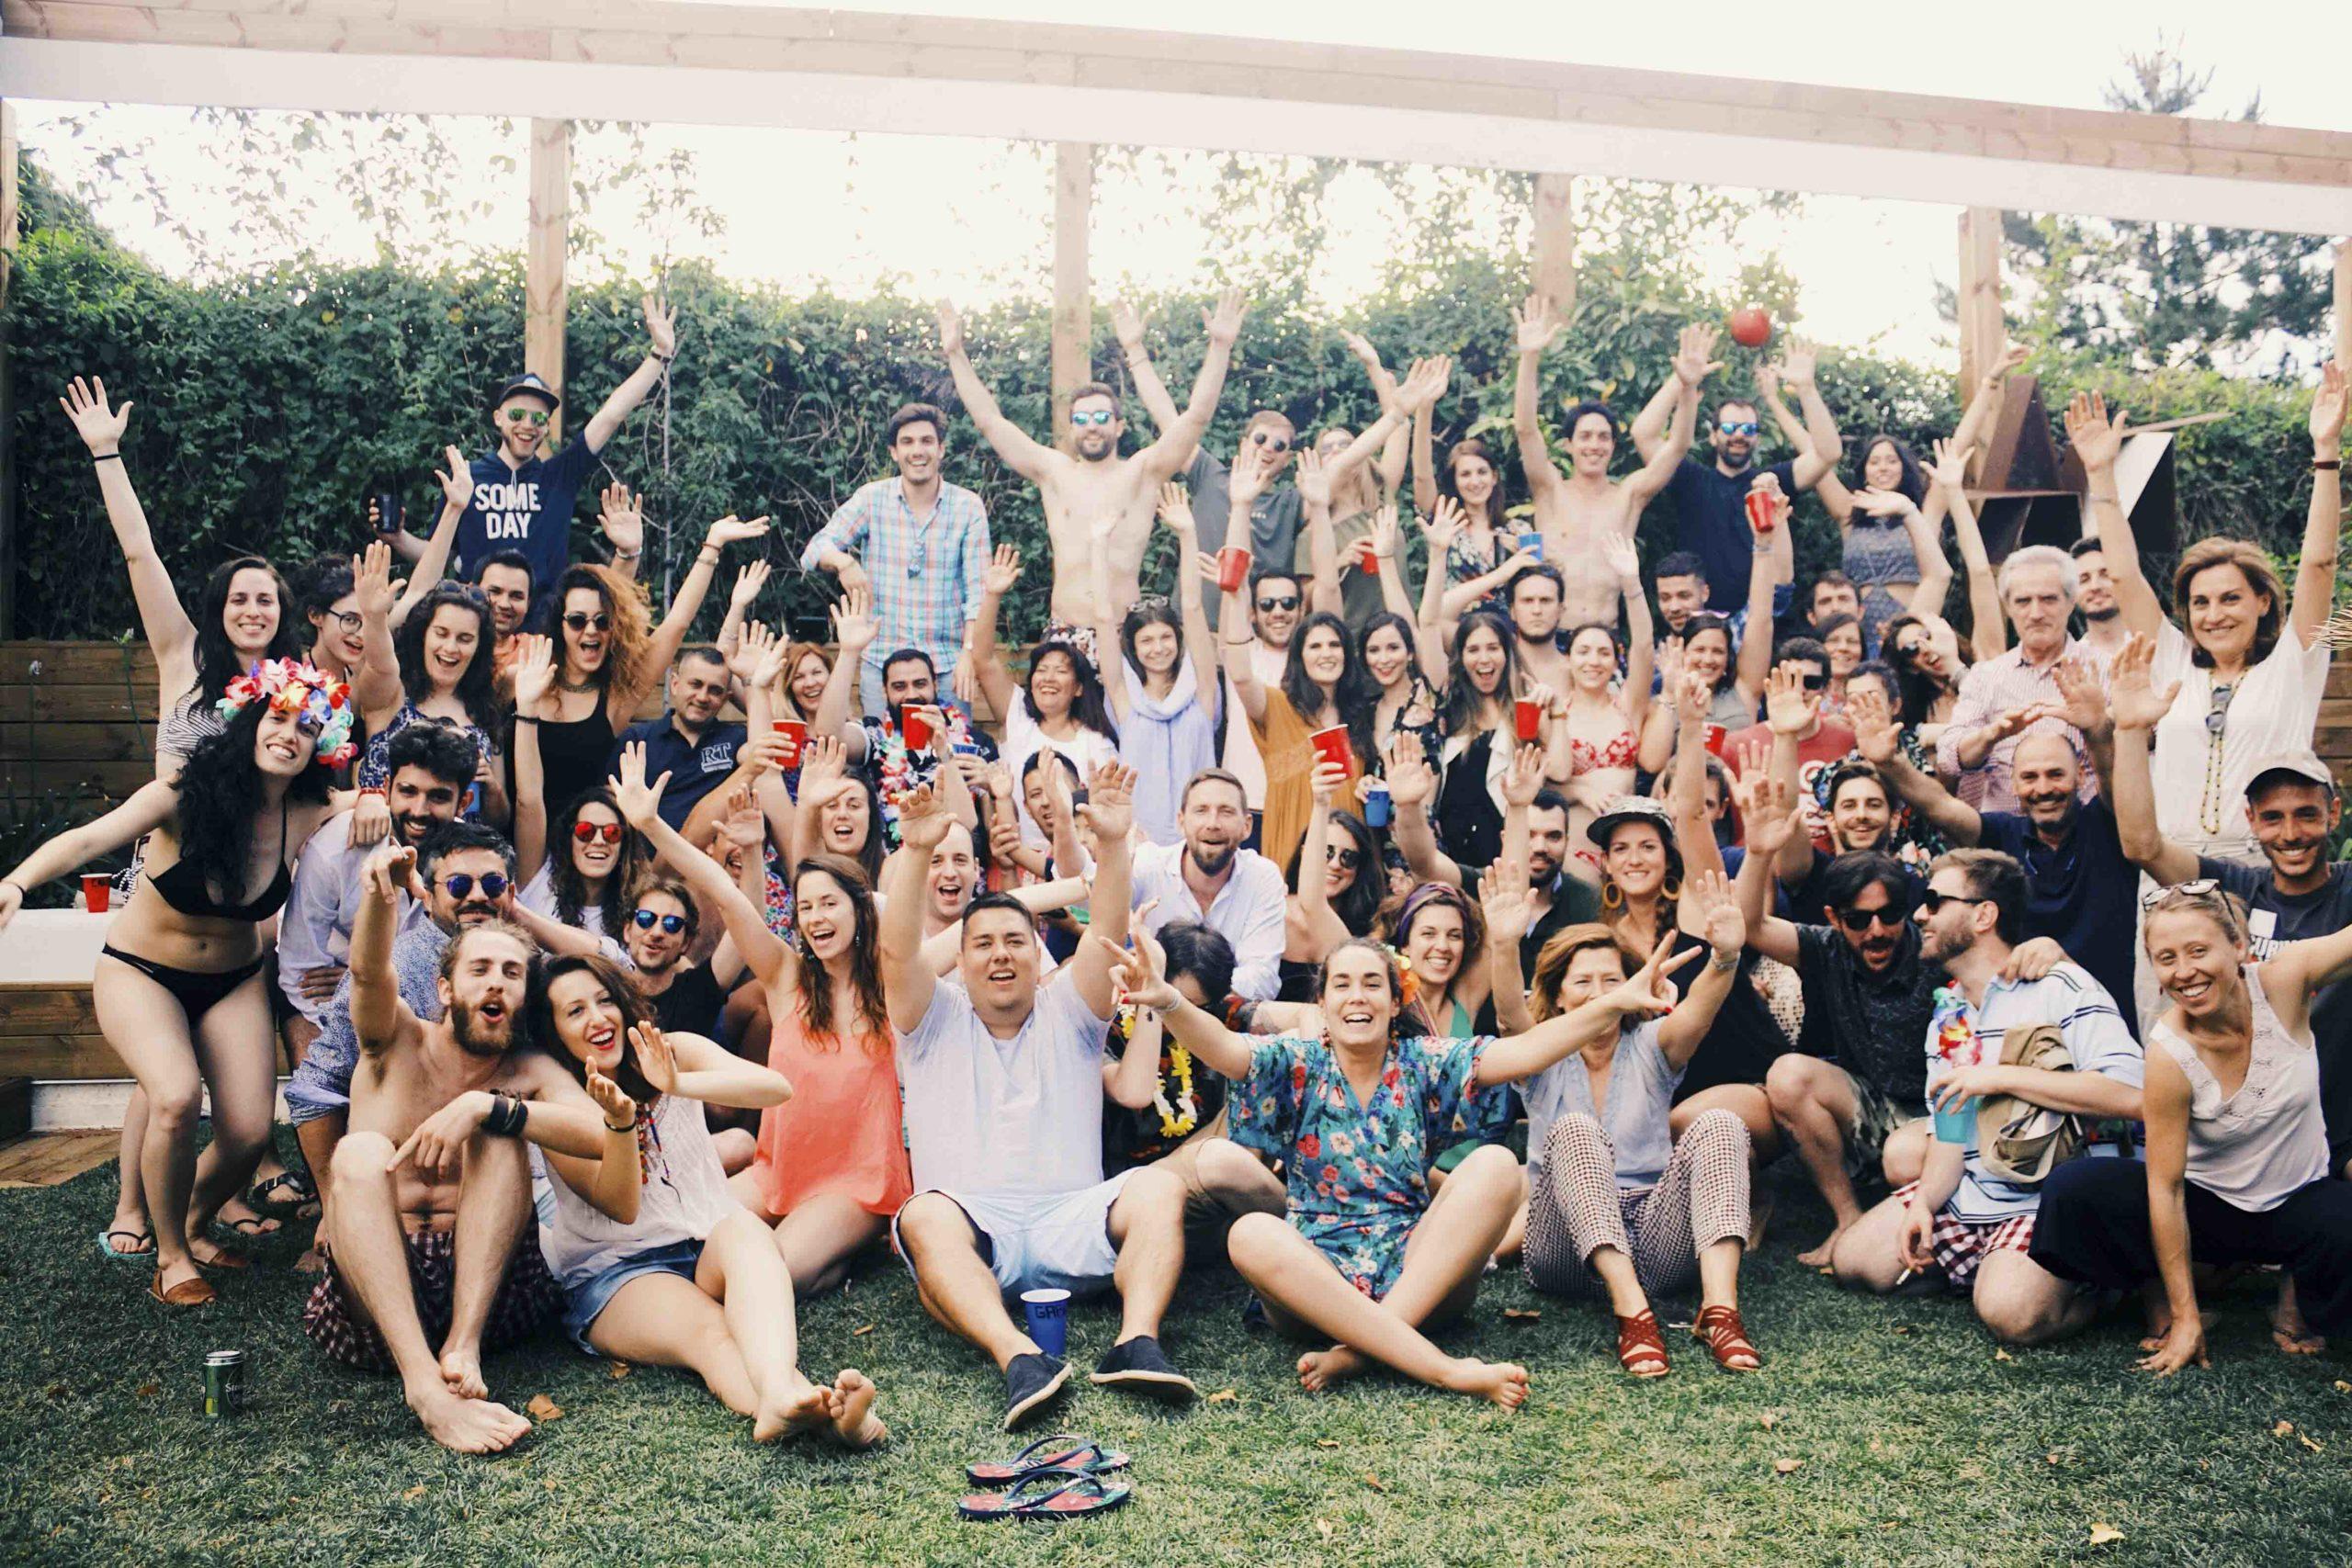 Fiesta verano grupal